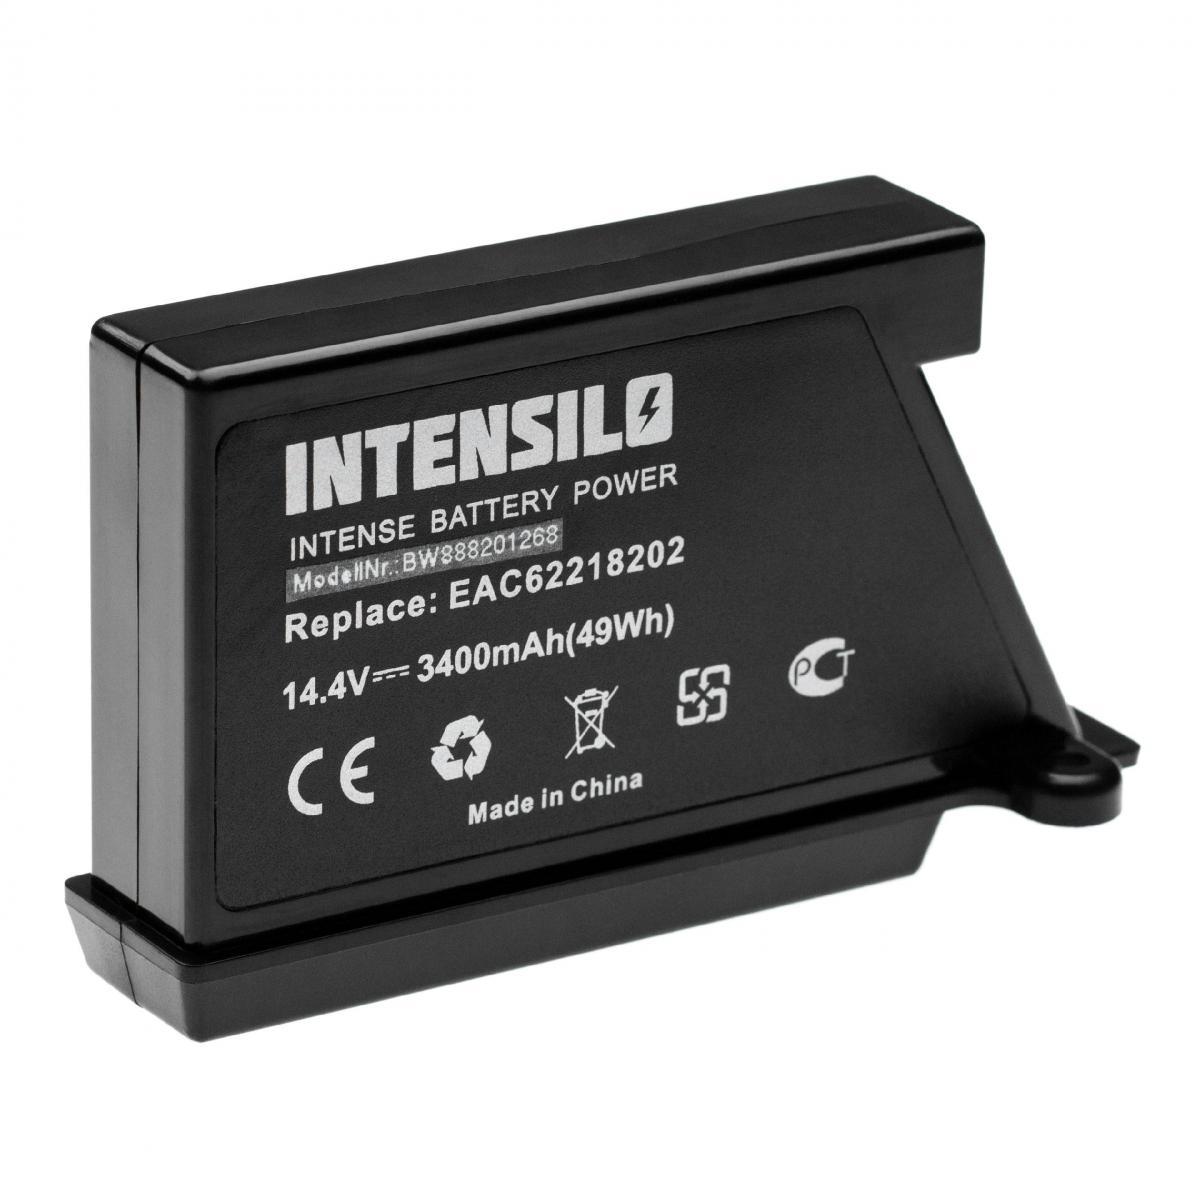 Vhbw INTENSILO Batterie compatible avec LG HOM-BOT VR64602LV, VR64604LV, VR64607 robot électroménager (3400mAh, 14,4V, Li-ion